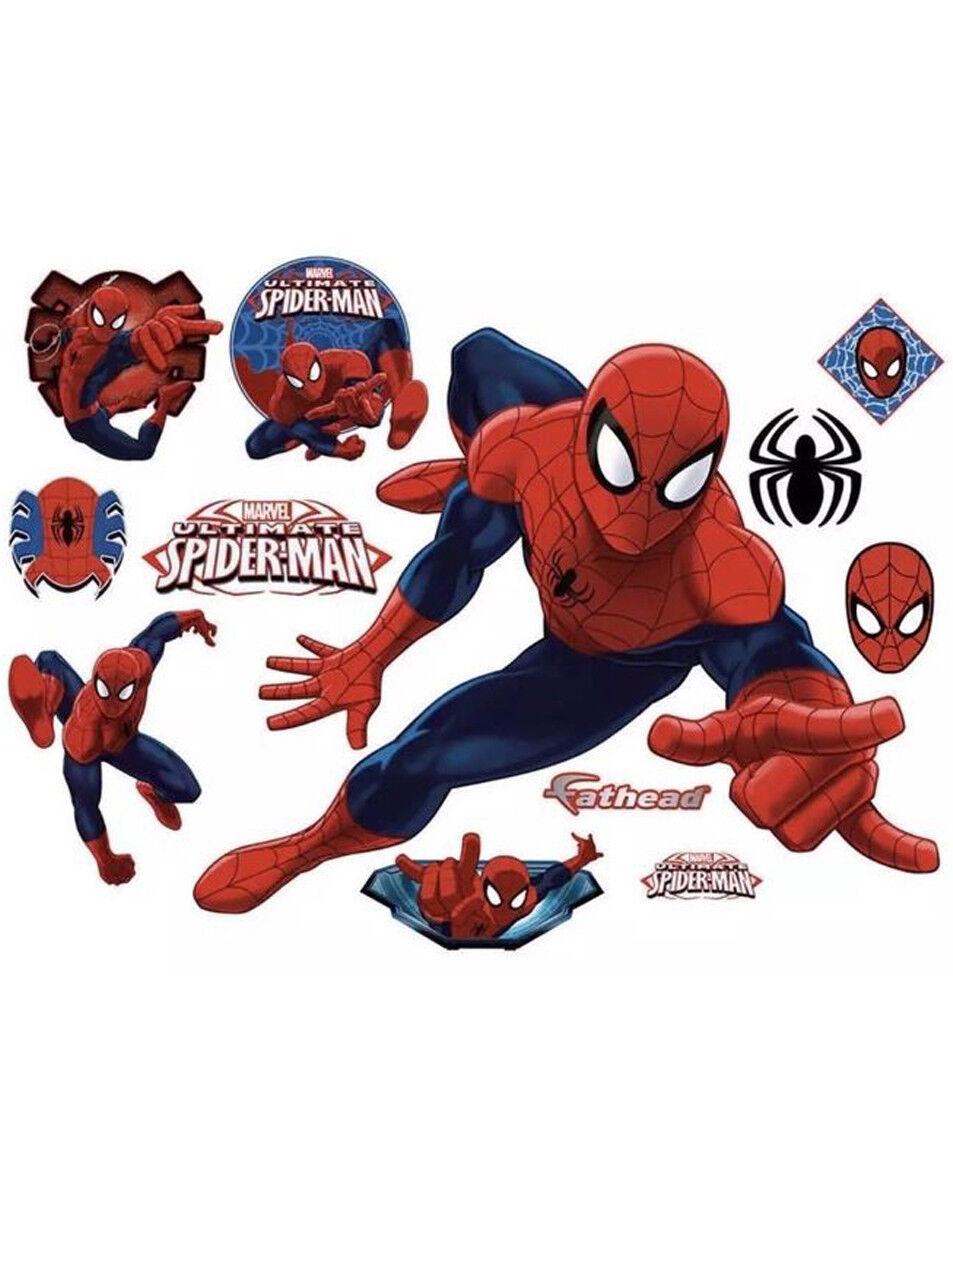 Ultimate Spider-Man Fathead Marvel Comics Real Big Wall Decor New 96-96091